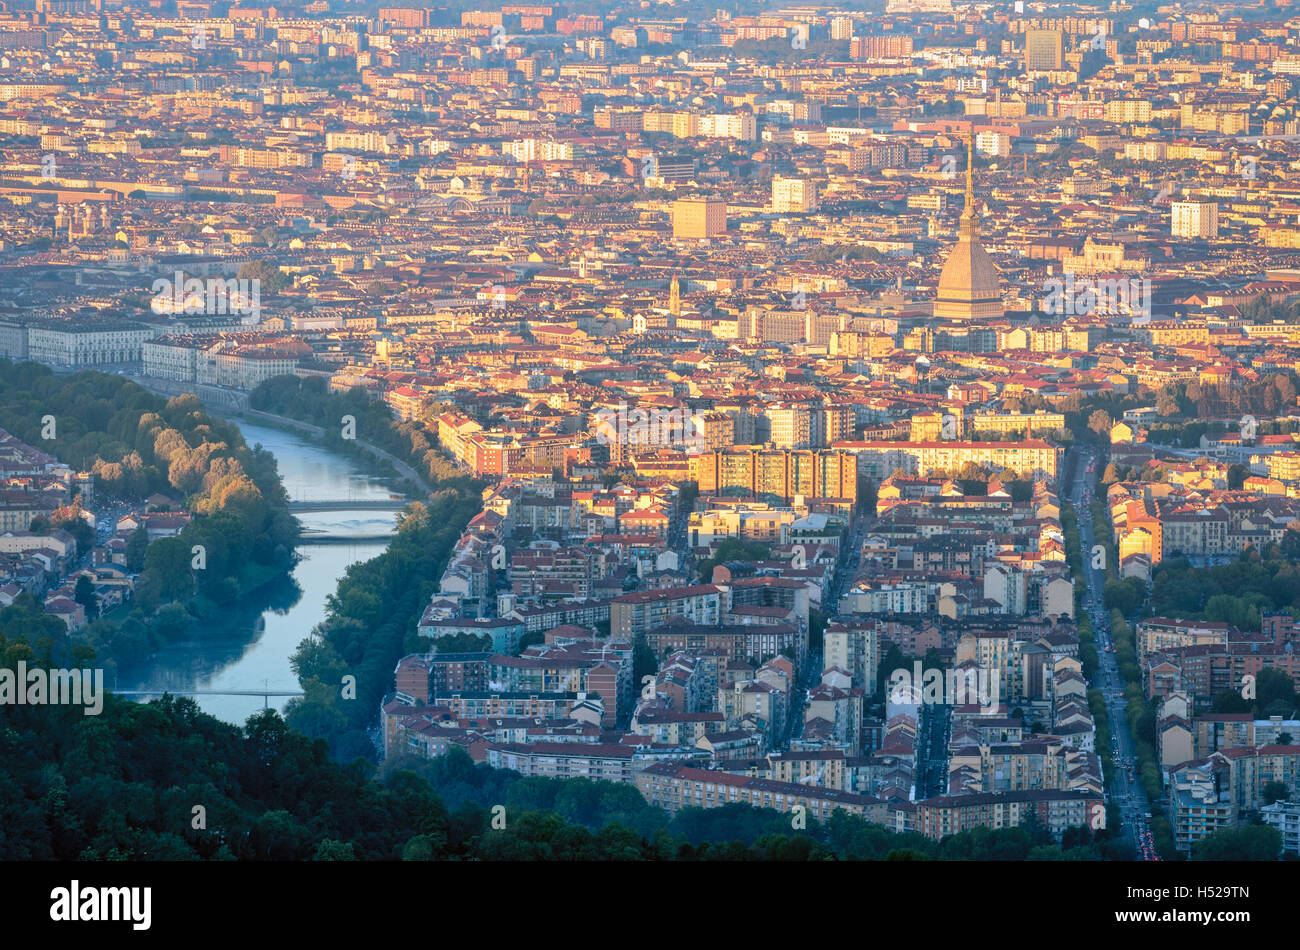 Turín (Torino) panorama al amanecer con la Mole Antonelliana Foto de stock